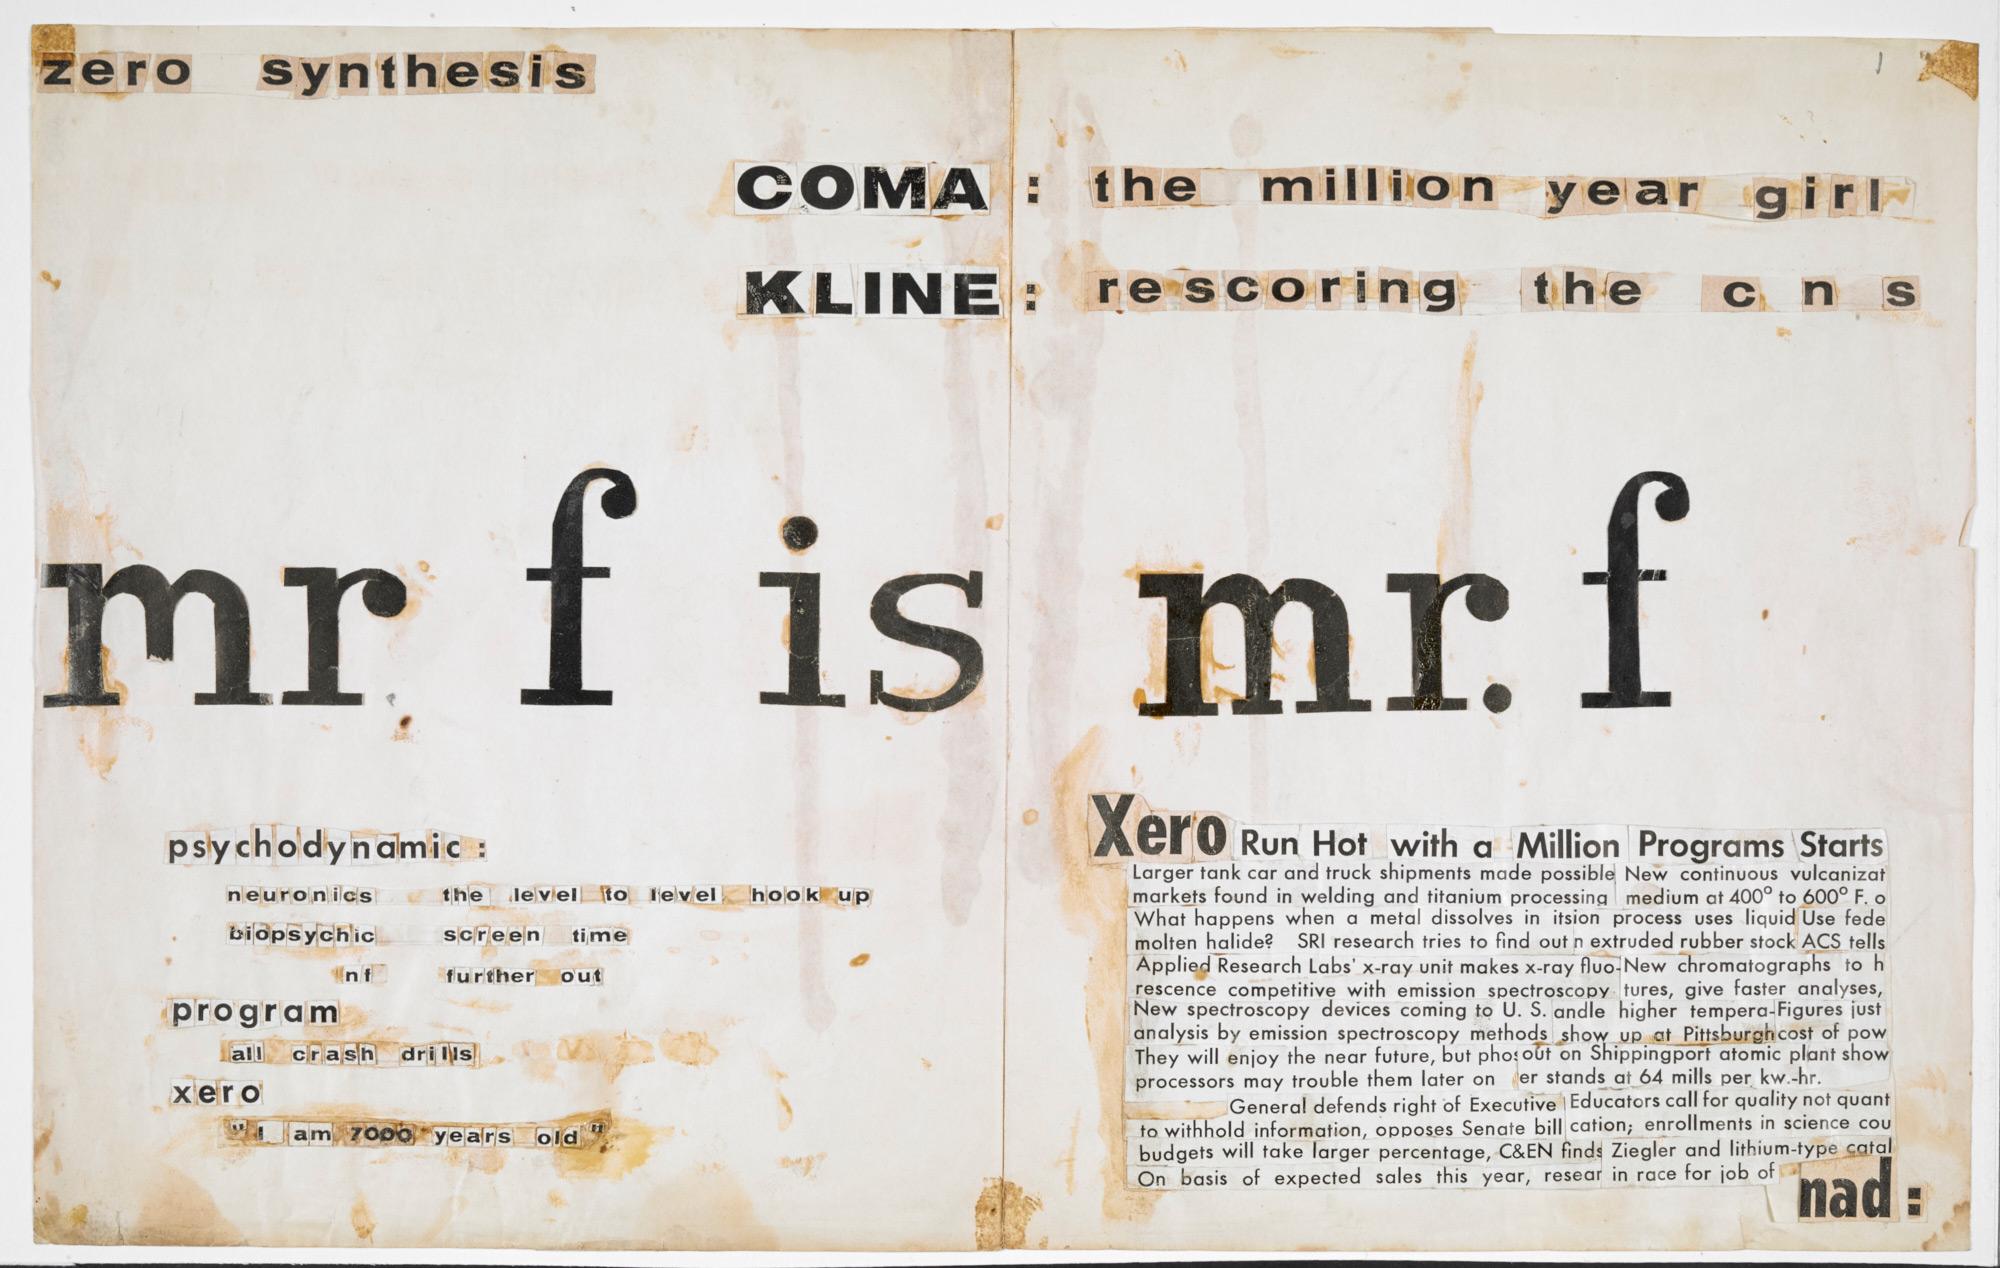 Text collages by J G Ballard, c. 1958